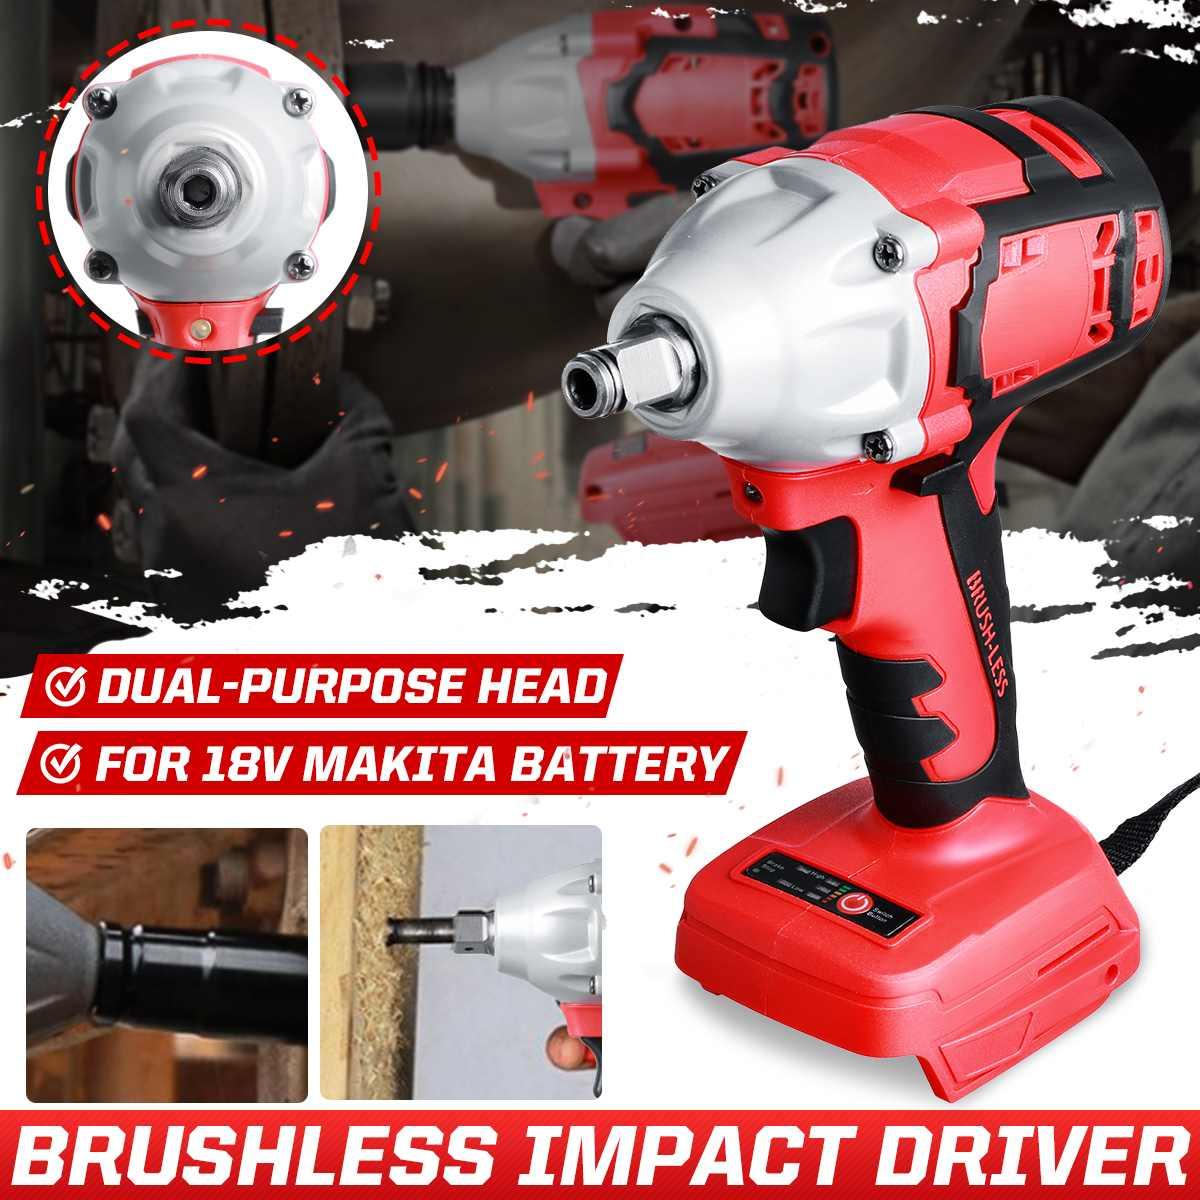 18v 880nm brushless chave de impacto elétrica dupla-uso chave de fenda elétrica broca 1/2 chave de soquete ferramenta elétrica para bateria makita